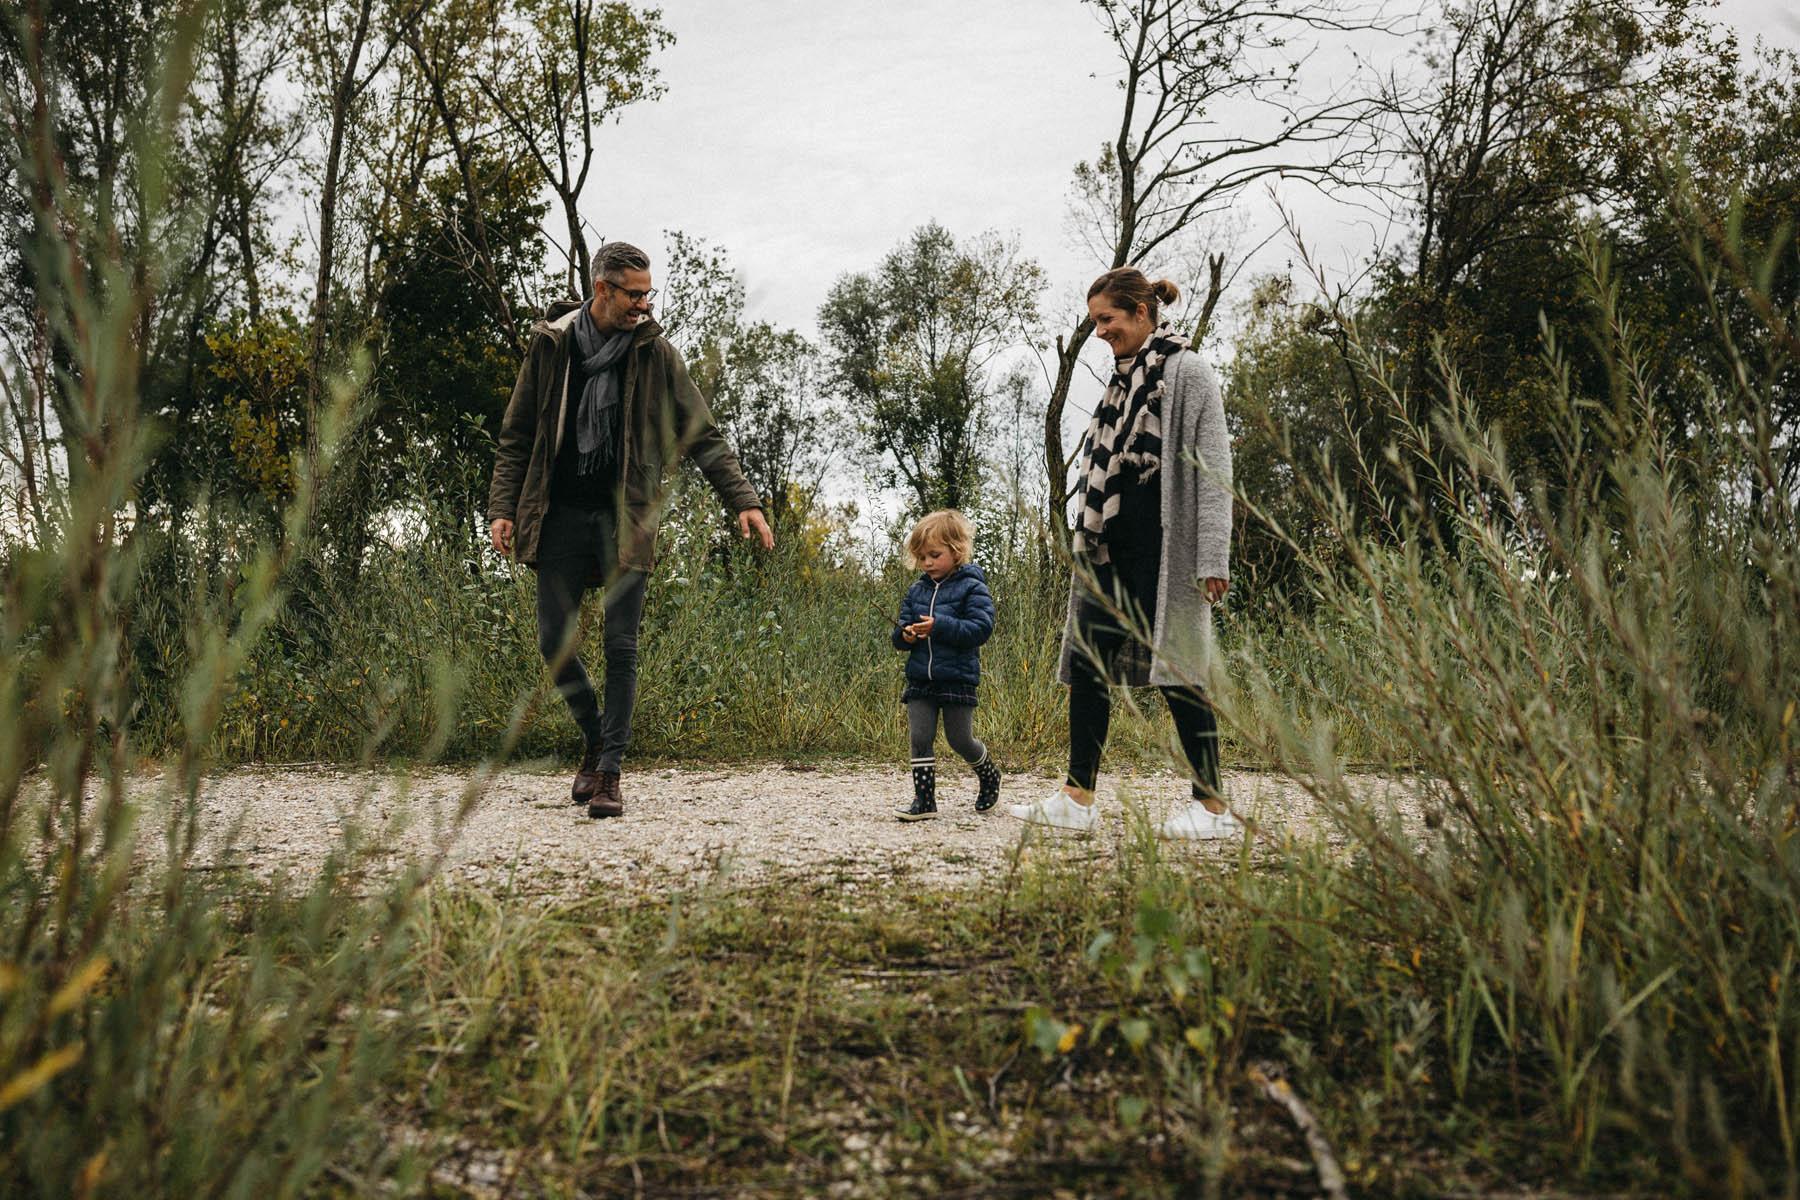 raissa simon fotografie familienfotos froettmaninger heide 003 - Annabel, Steffen + Cleo